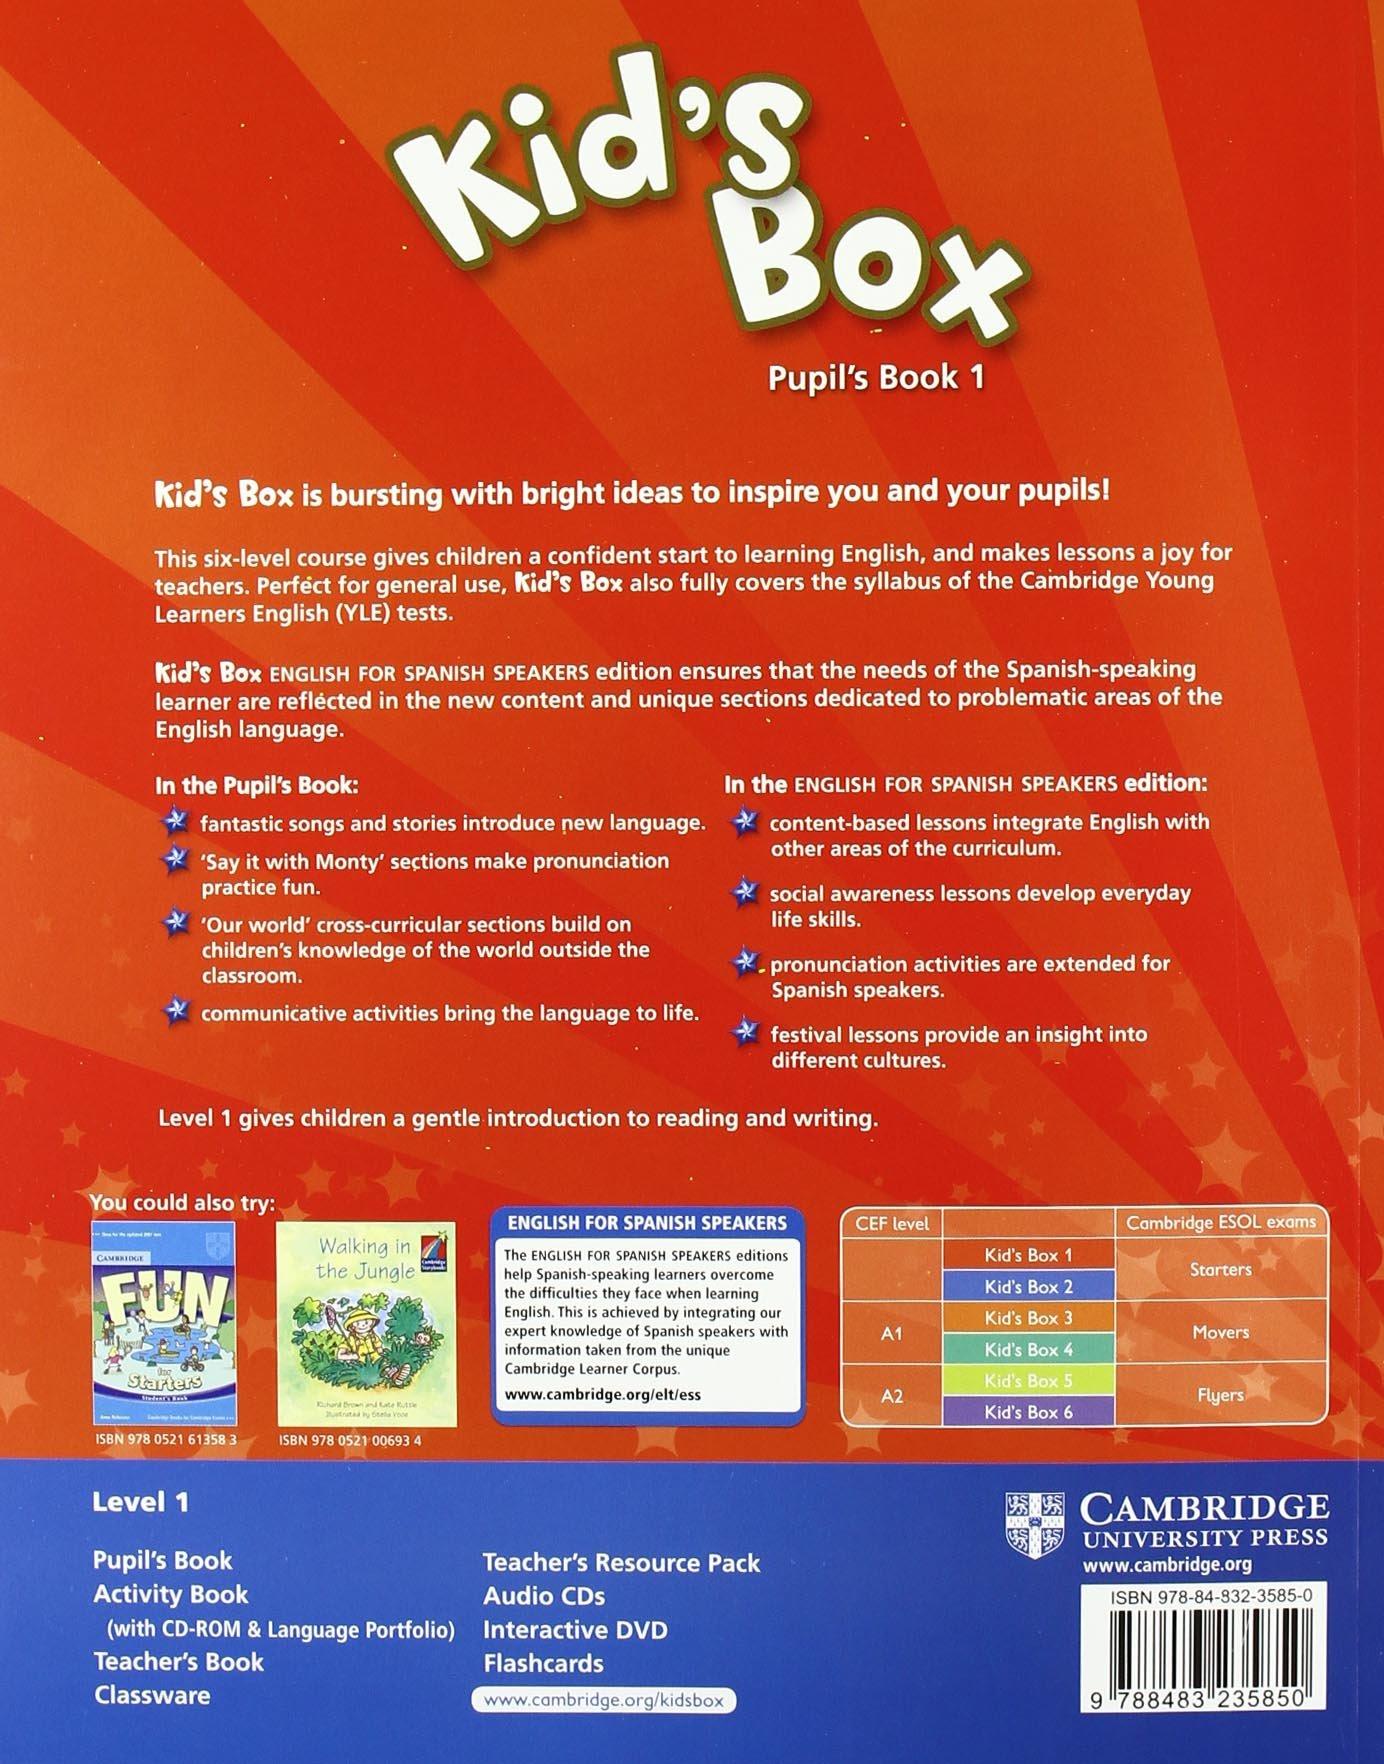 Kid's Box for Spanish Speakers 1 Pupil's Book - 9788483235850: Amazon.es:  Caroline Nixon, Michael Tomlinson: Libros en idiomas extranjeros